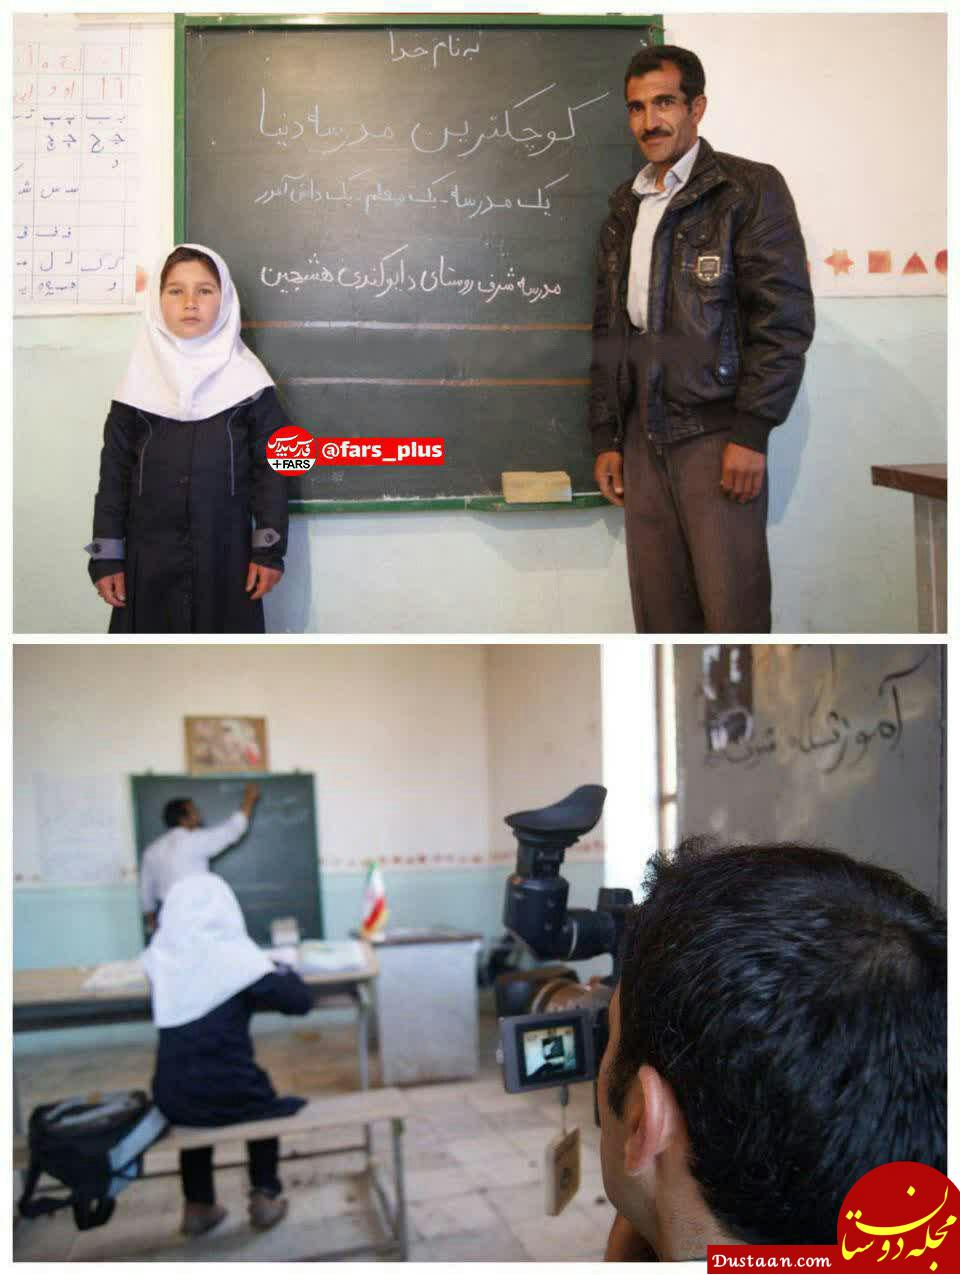 www.dustaan.com عکس: کوچکترین مدرسه جهان در اردبیل!